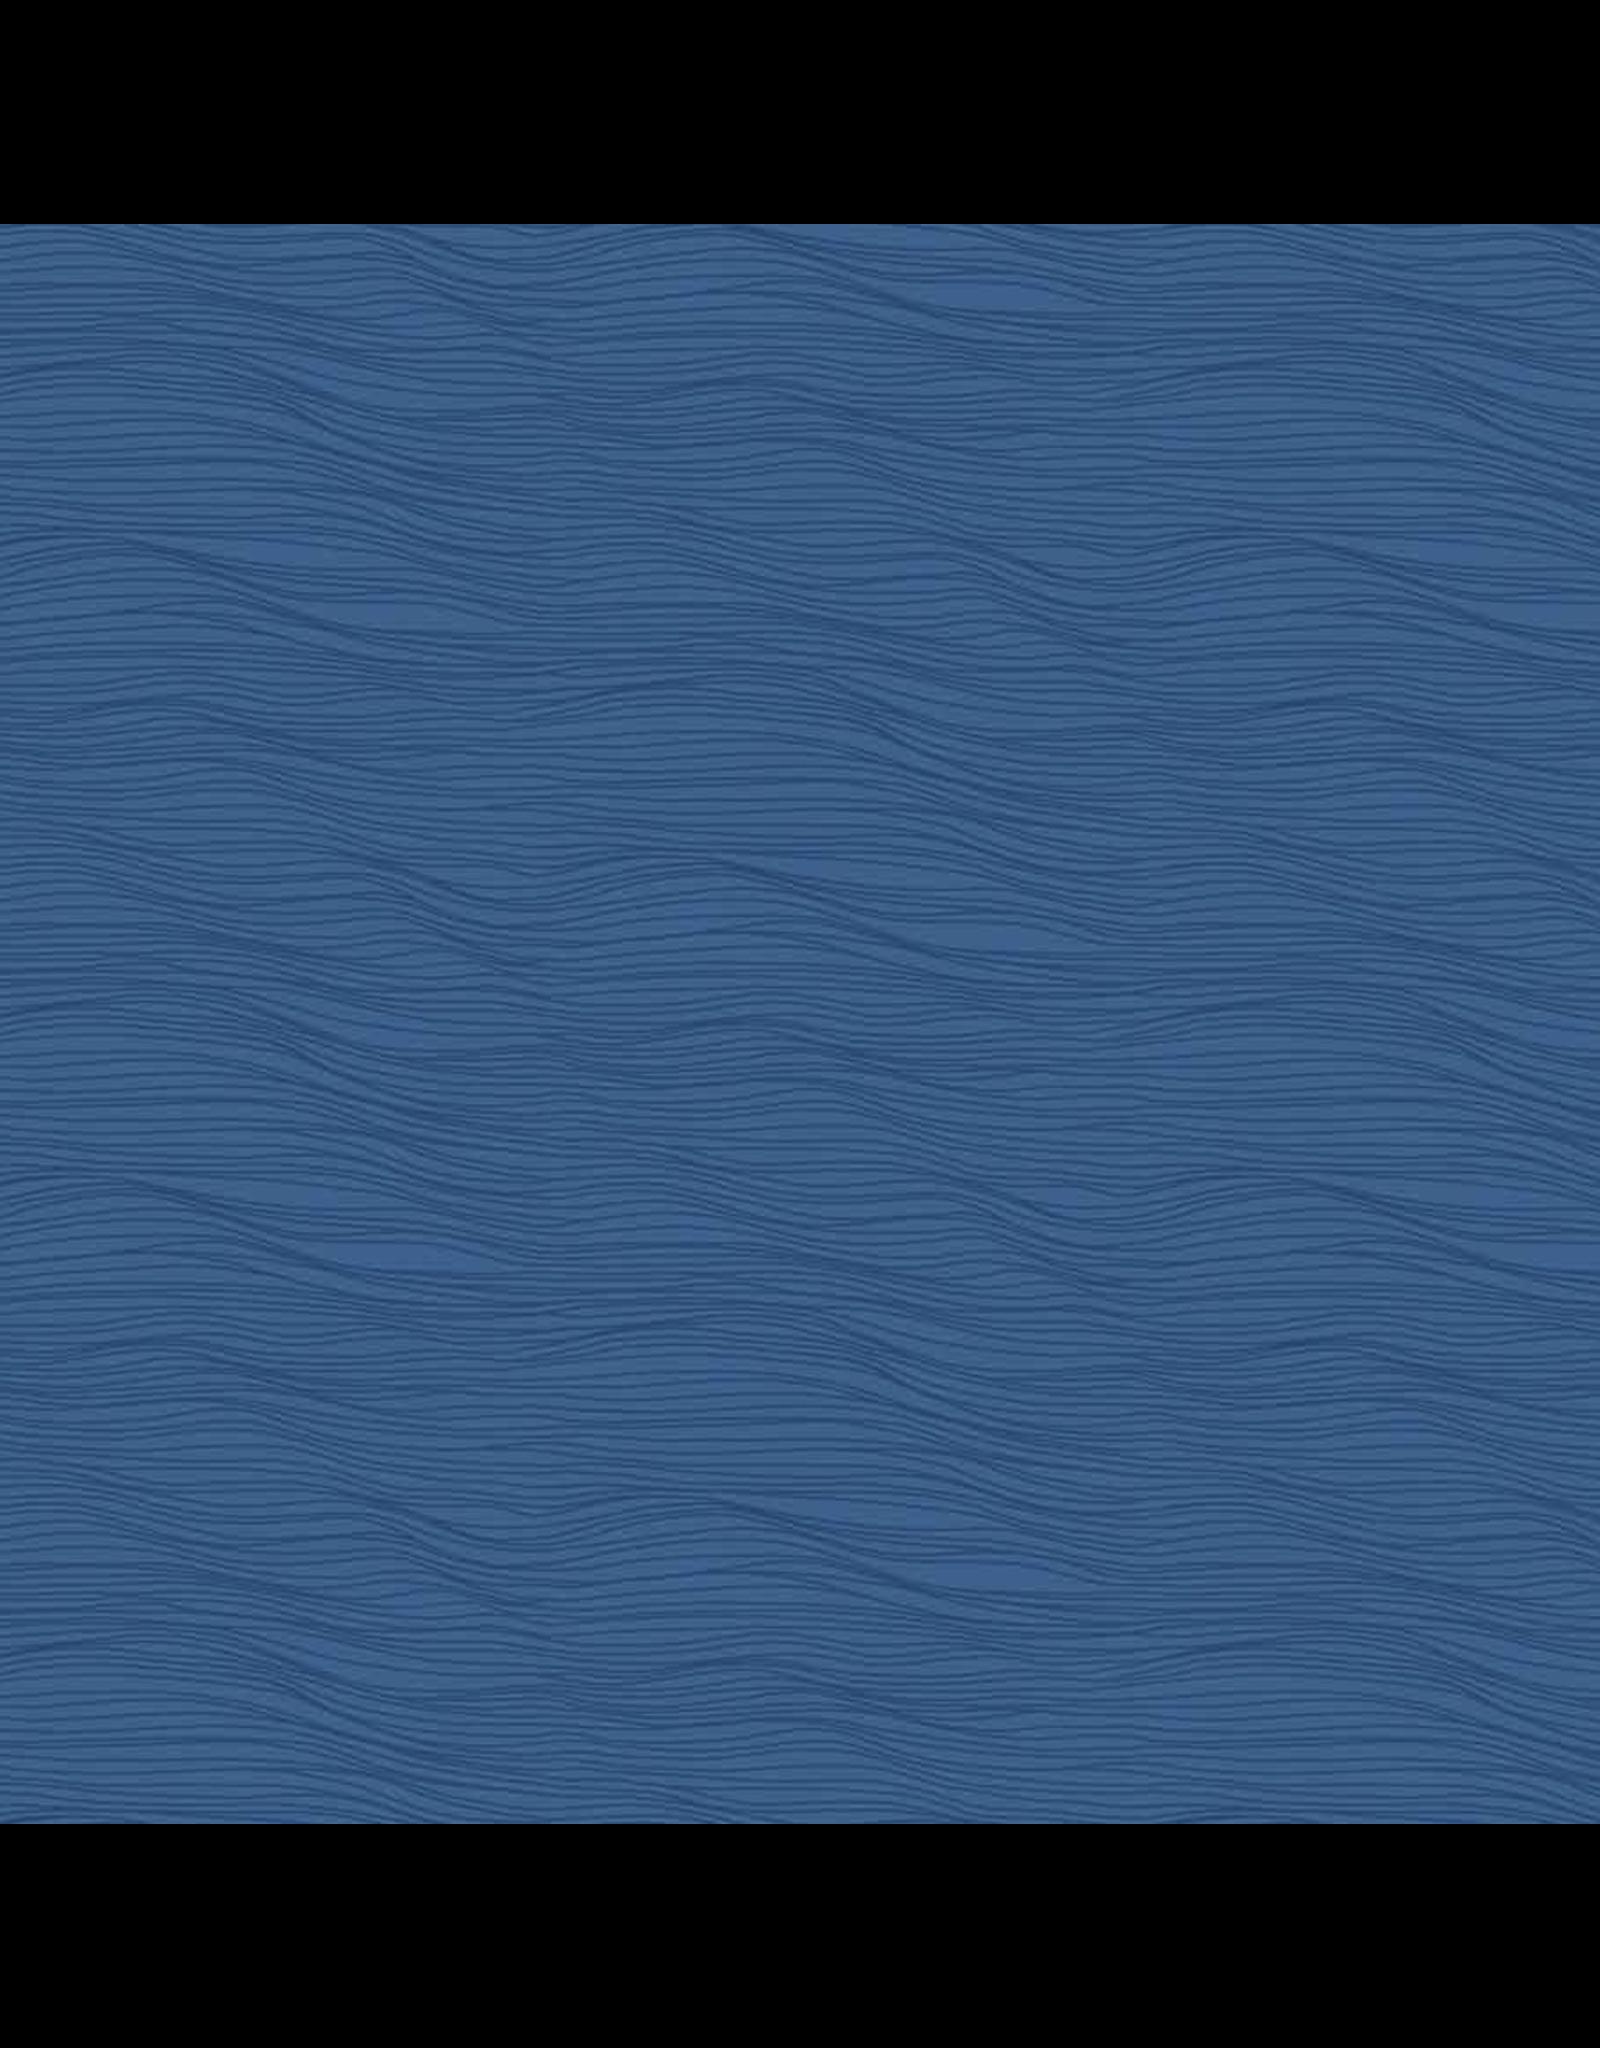 Figo Elements, Water in Blue, Fabric Half-Yards